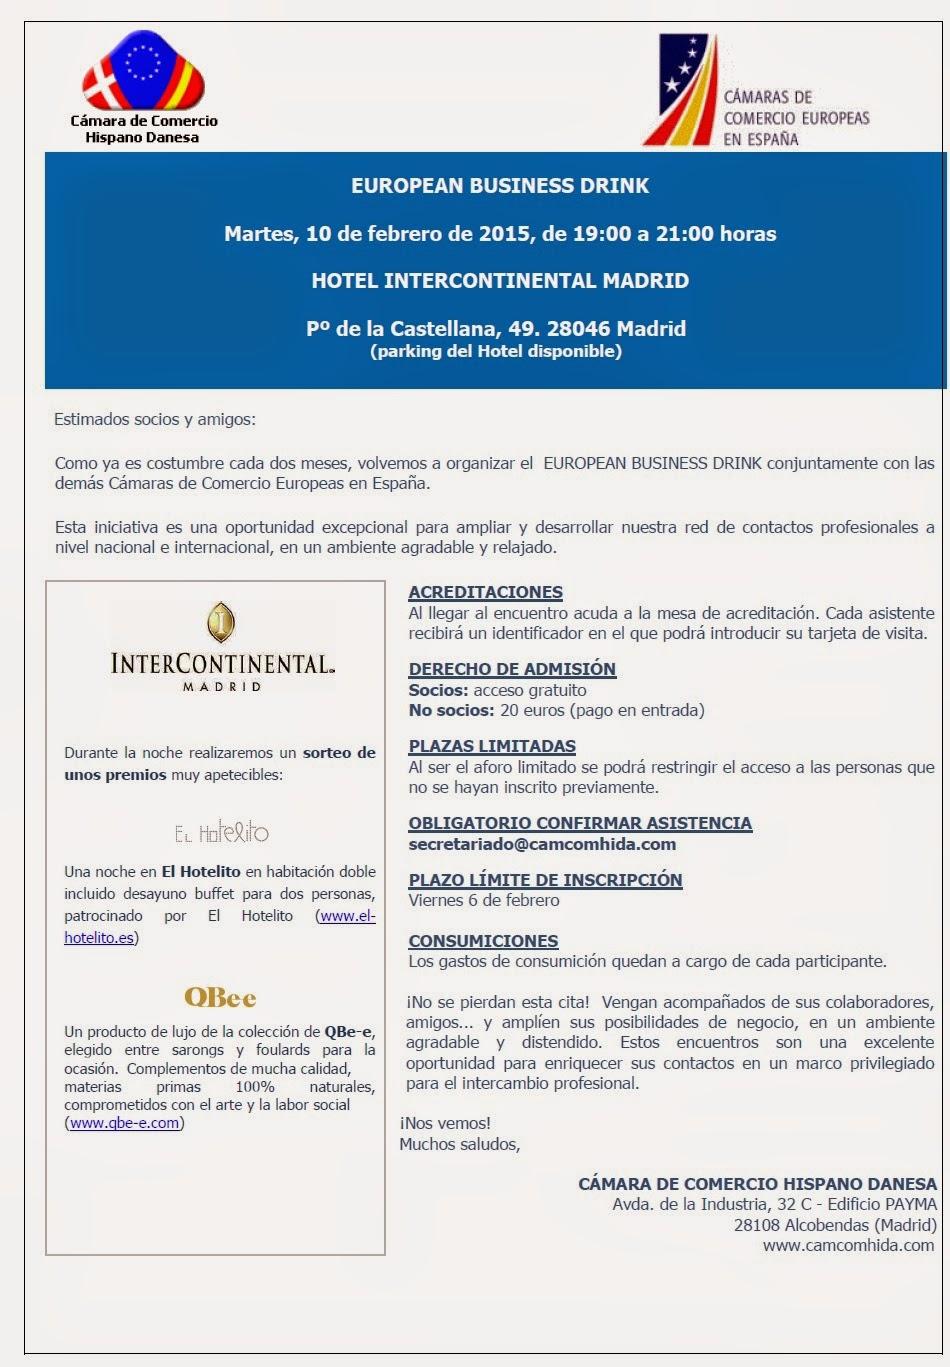 EuropeanBusinessDrinkInvitacion10Febrero2015